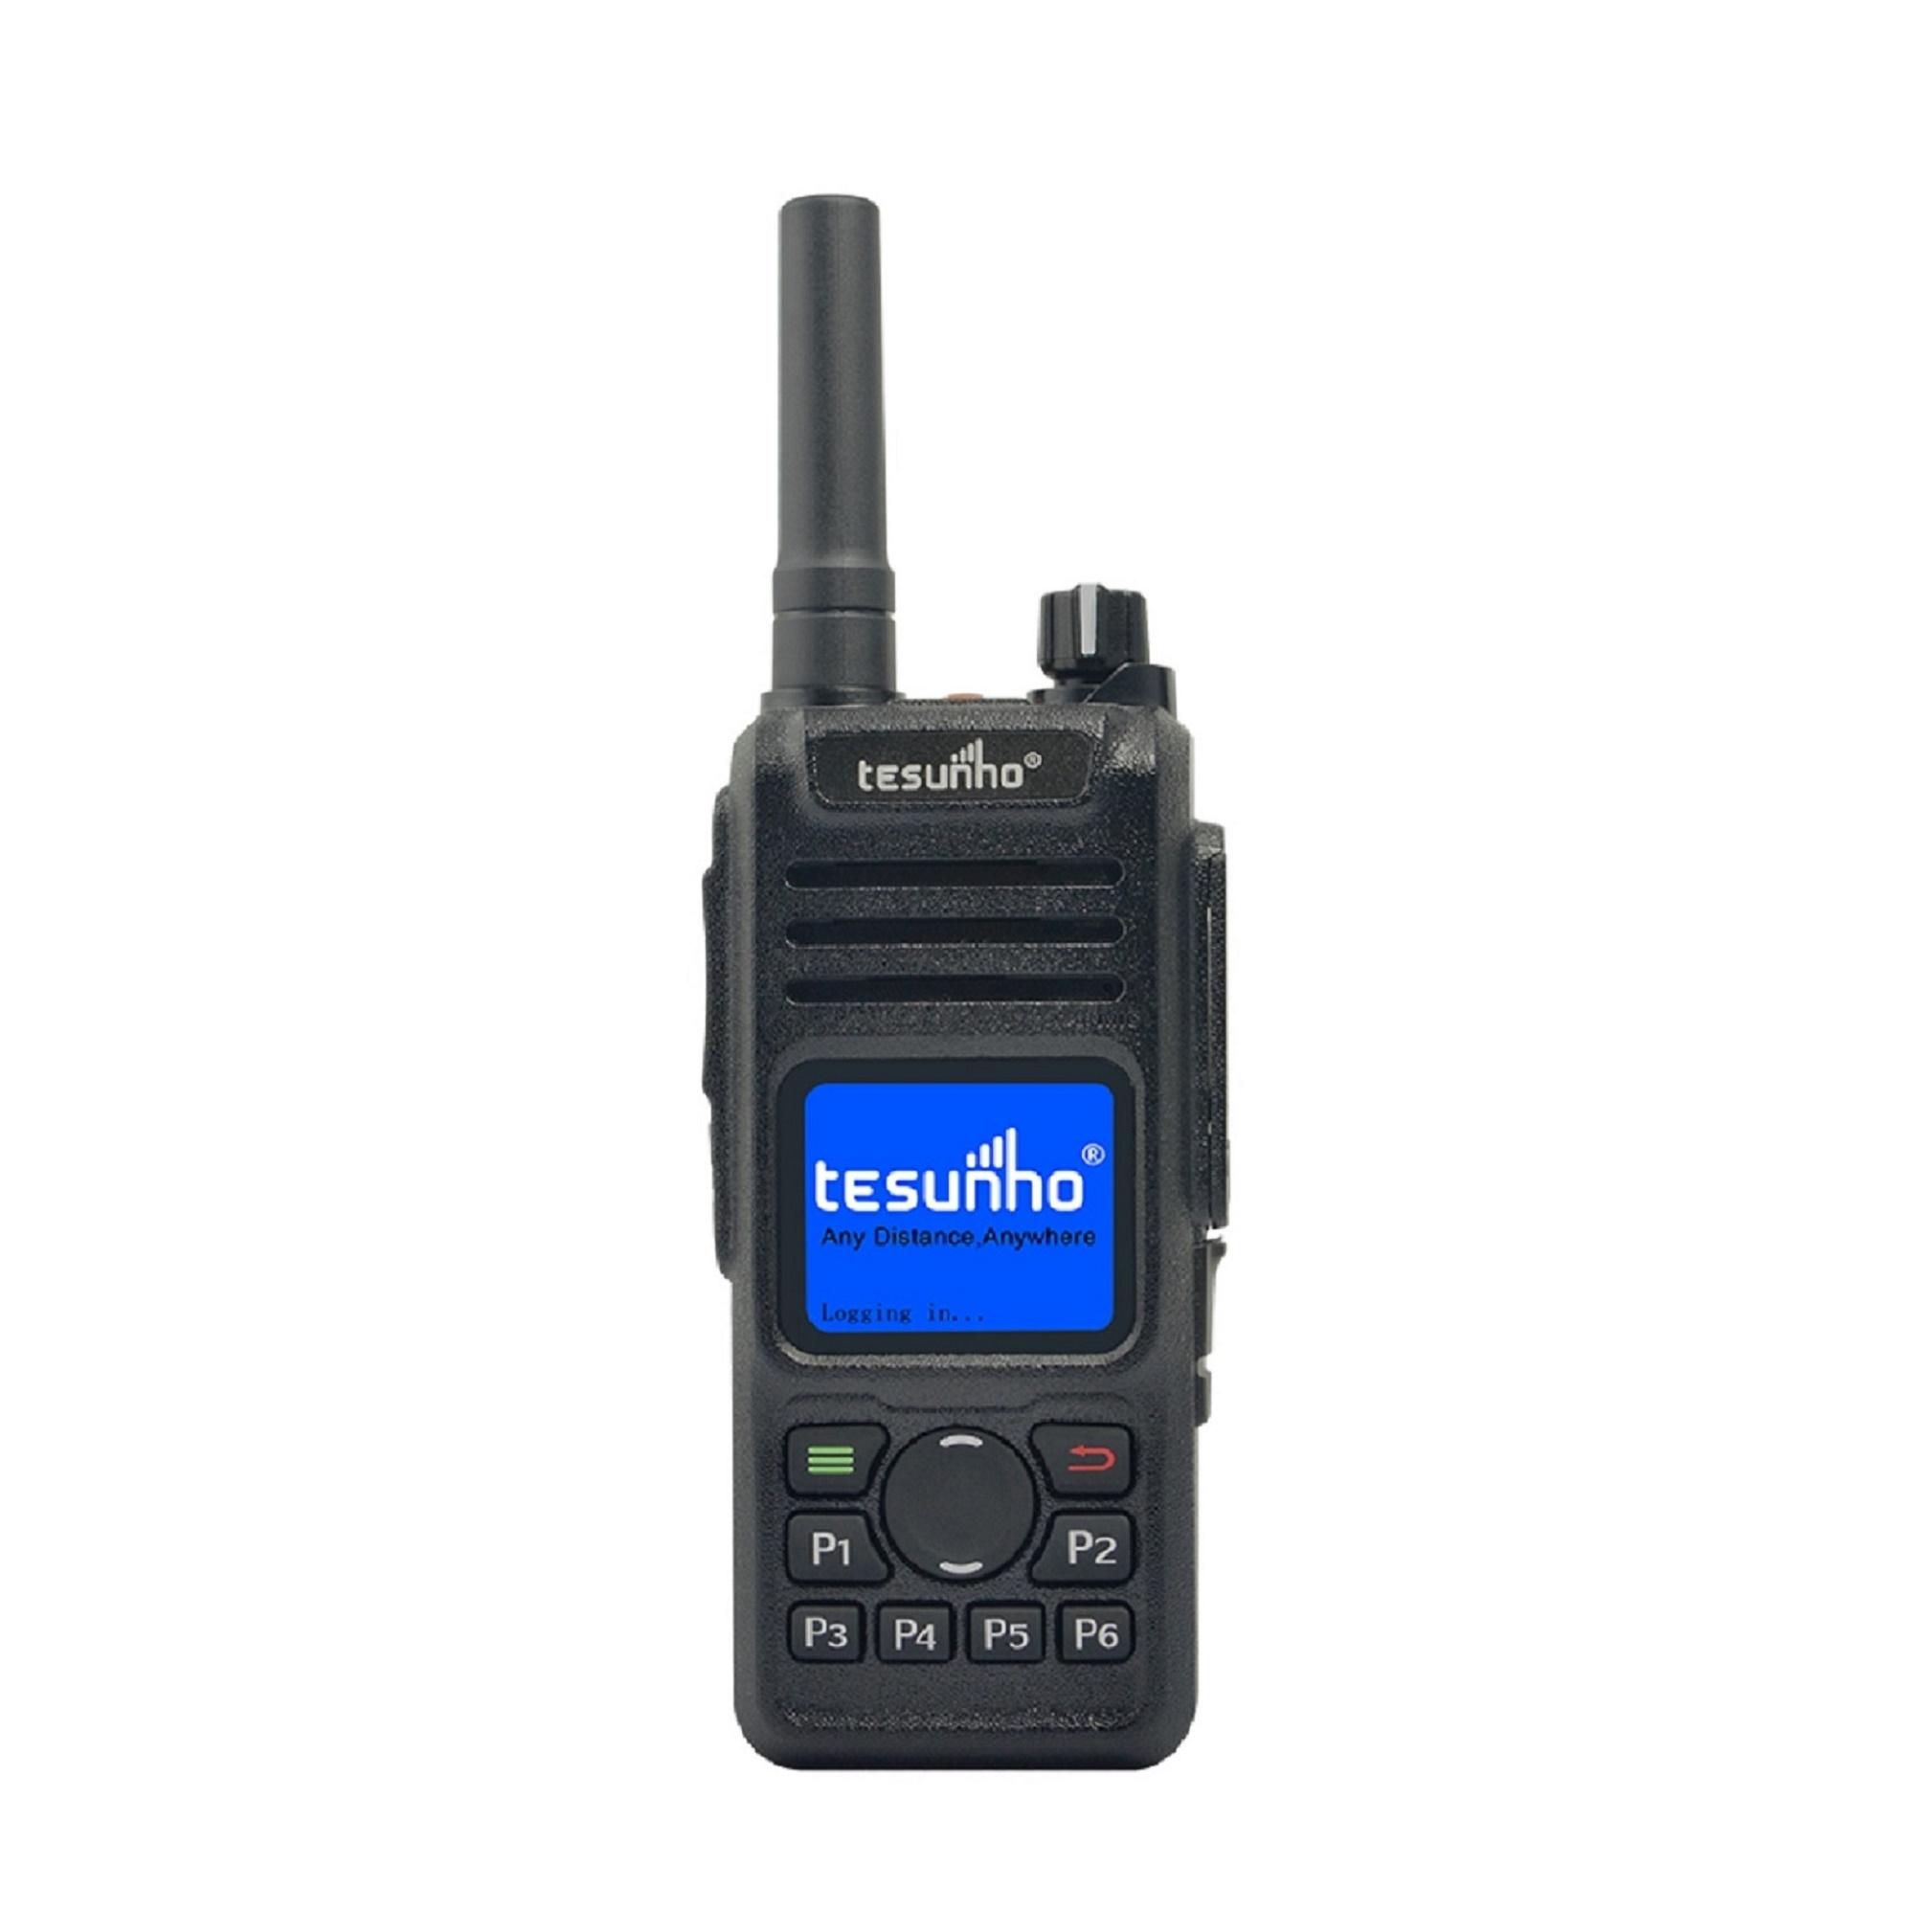 Tesunho Internet Radio With RFID GPS Patrol Walkie Talkie TH-682